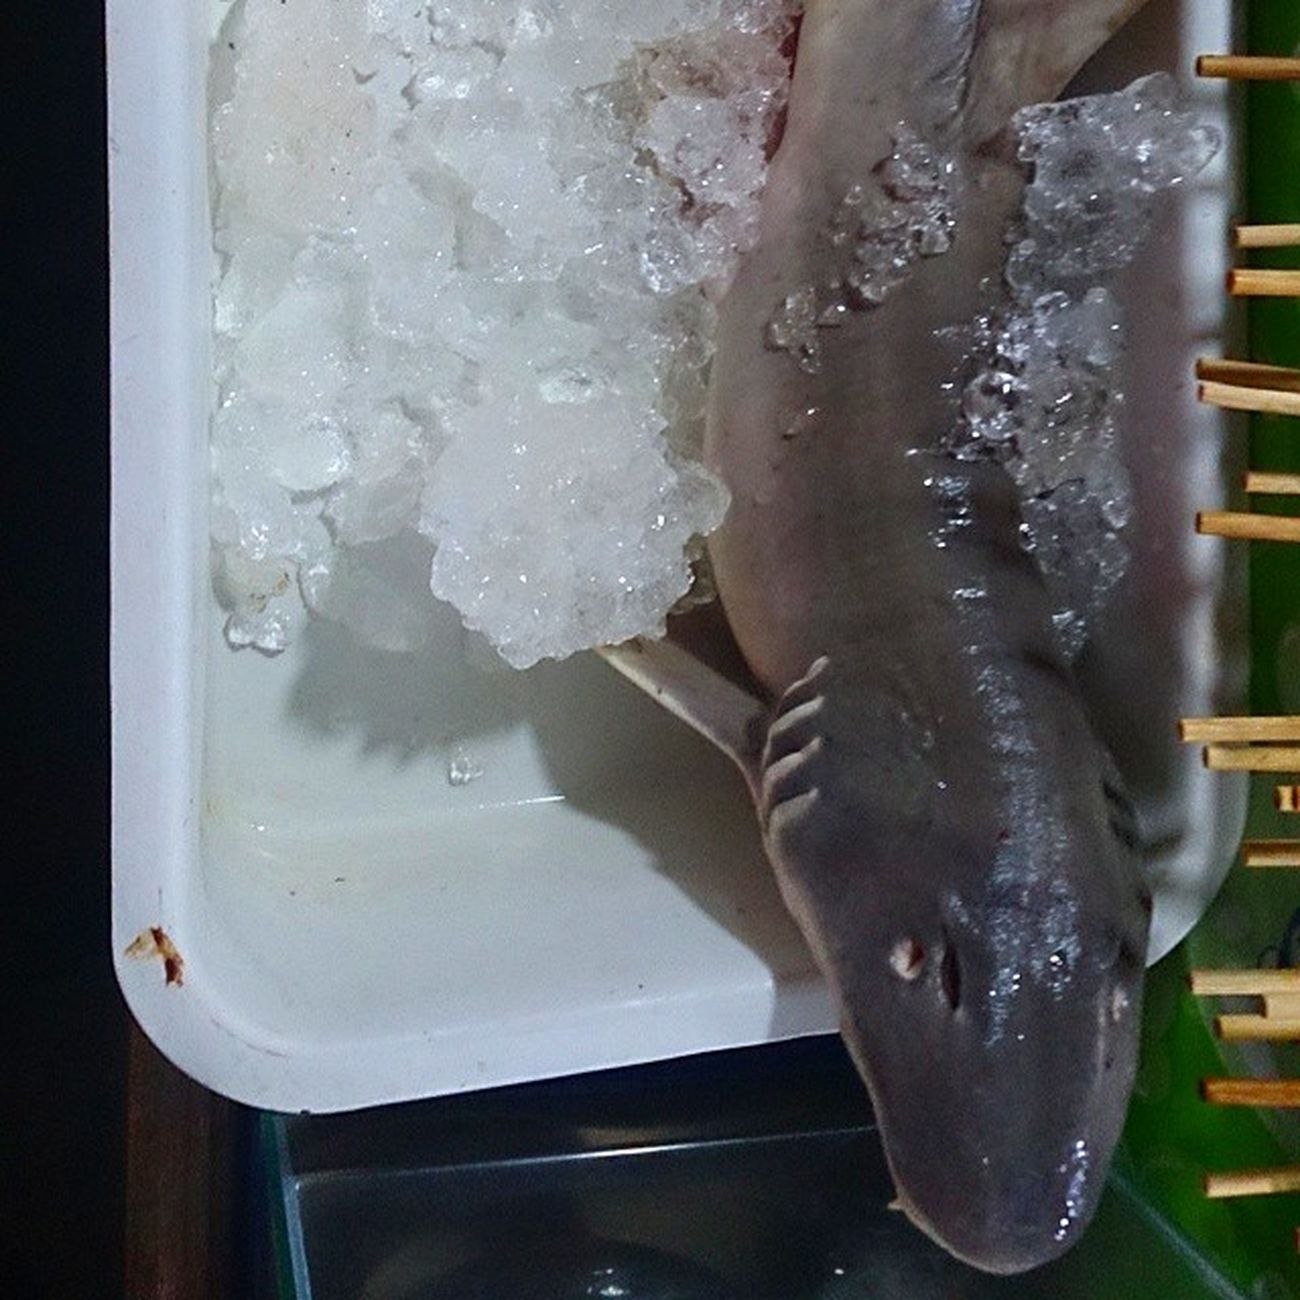 АкулаЕда вкусно нестрашно если не сфоткал-значит, не съел...sharkfood